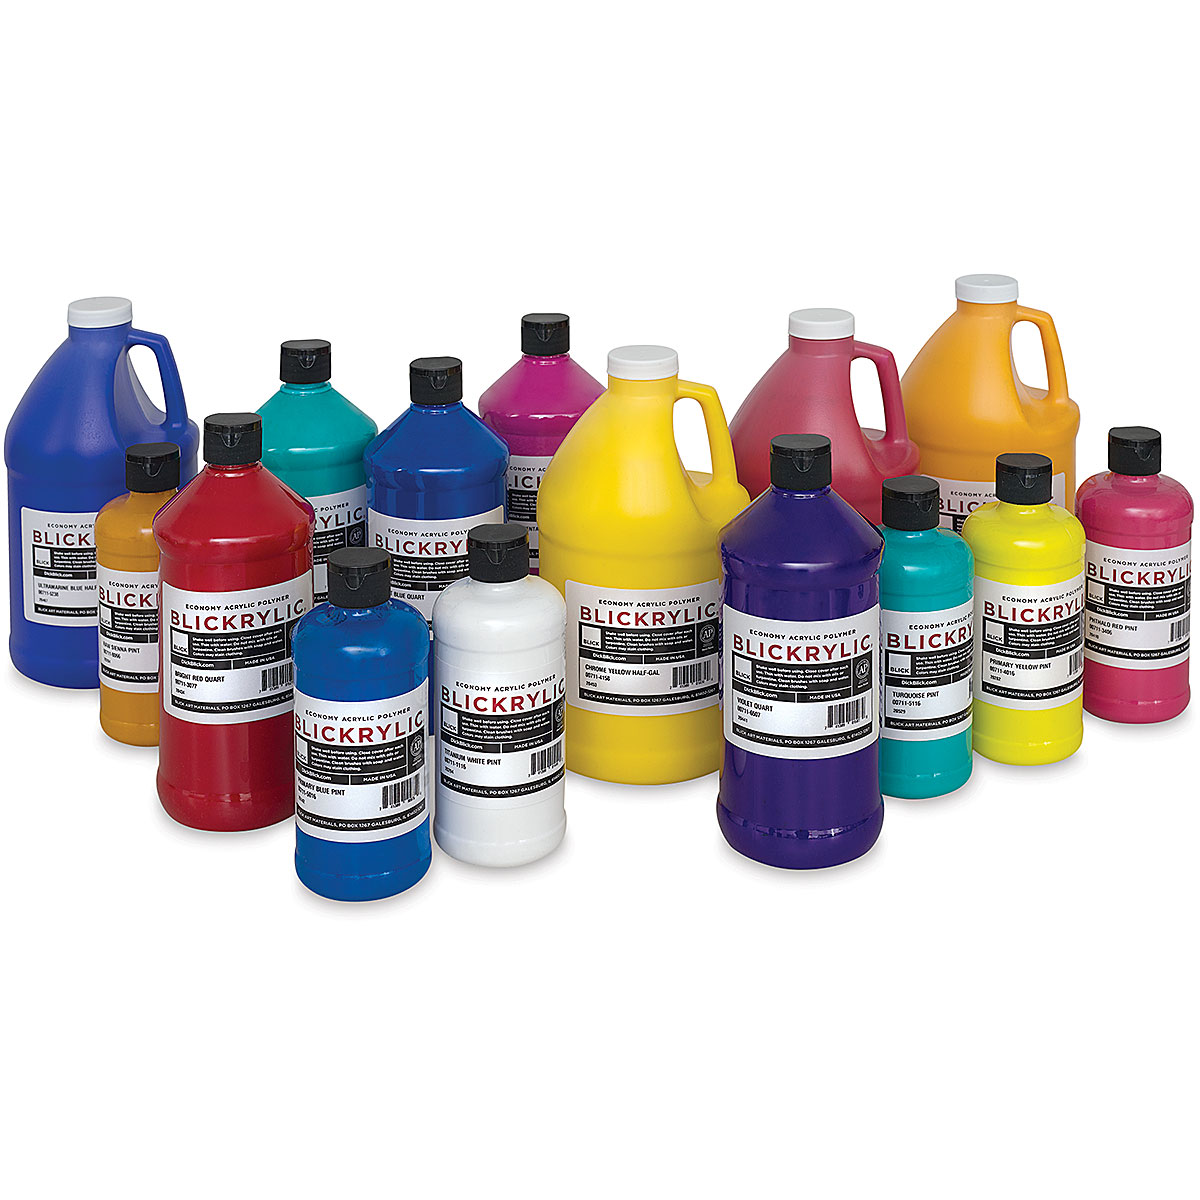 Acrylic Paint Sets Blick Art Materials